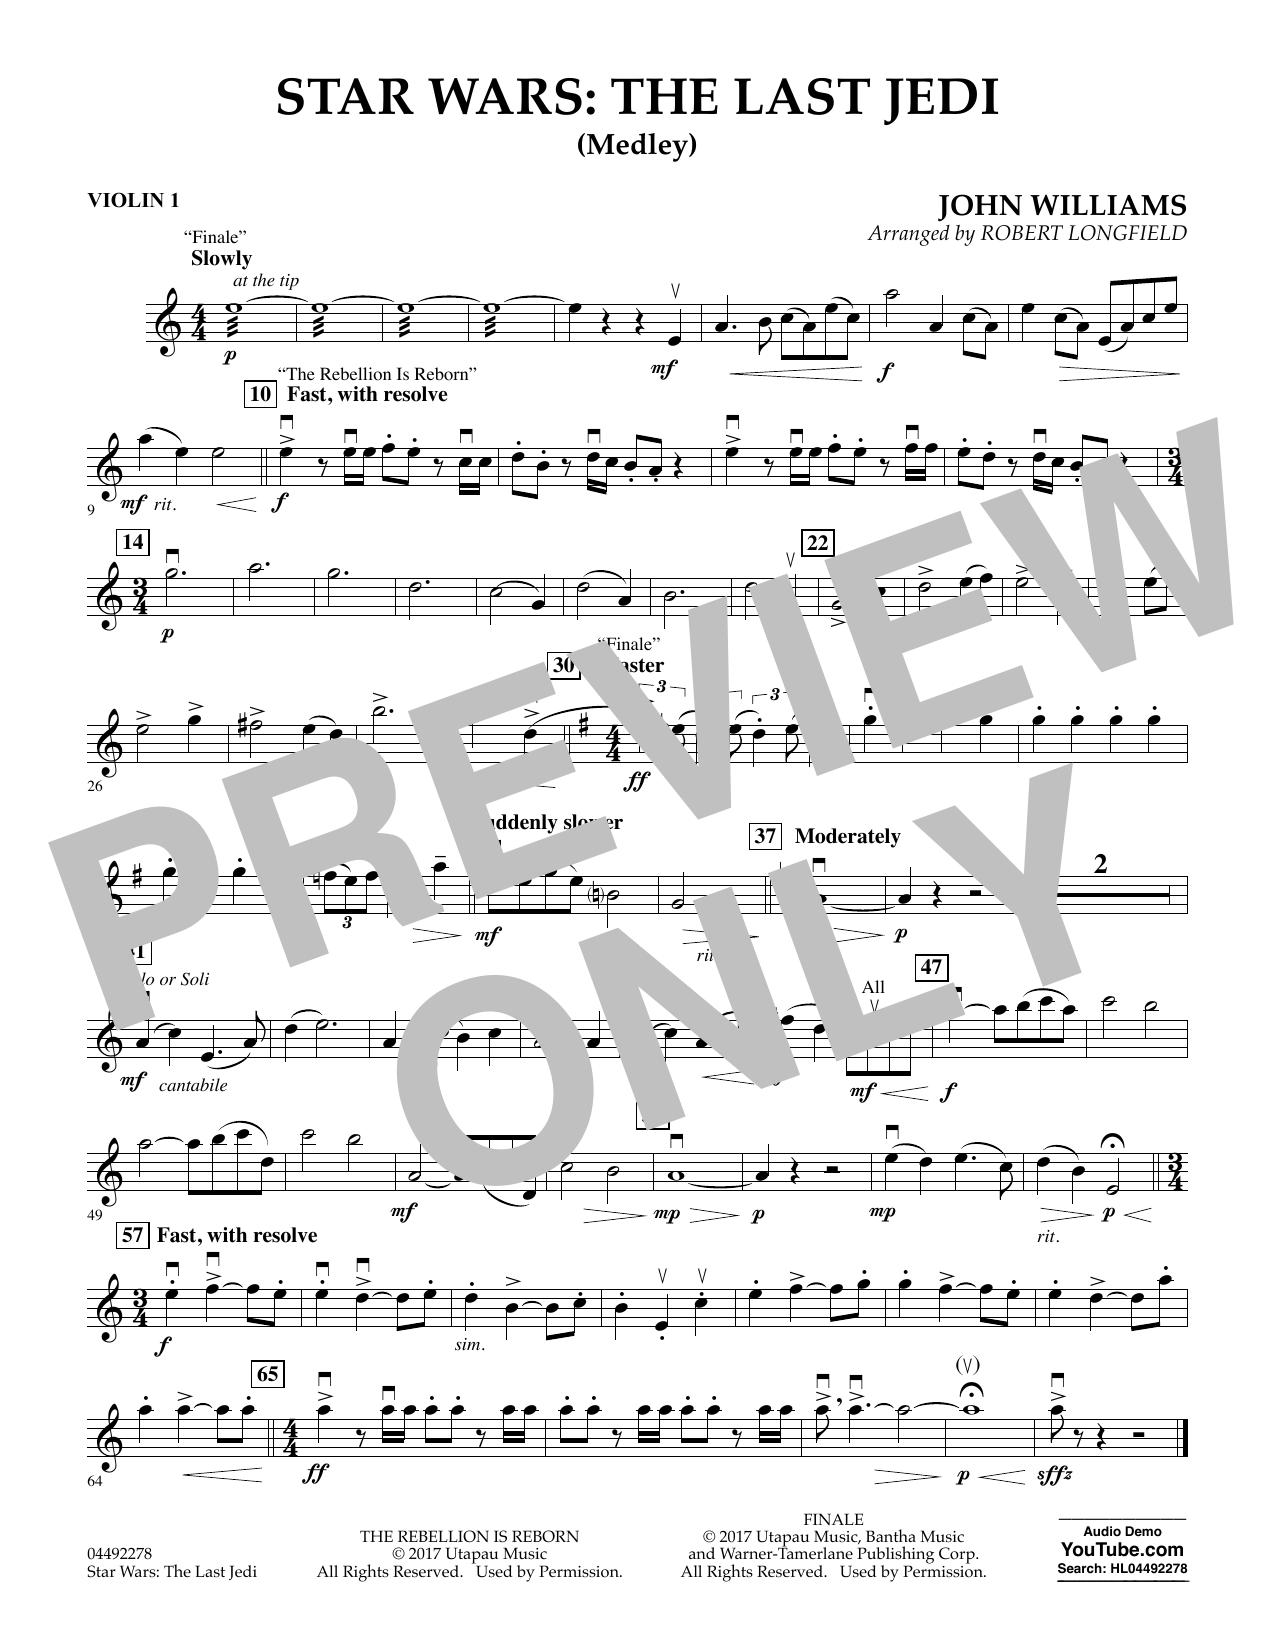 Star Wars: The Last Jedi (Medley) (arr. Robert Longfield) - Violin 1 (Orchestra)